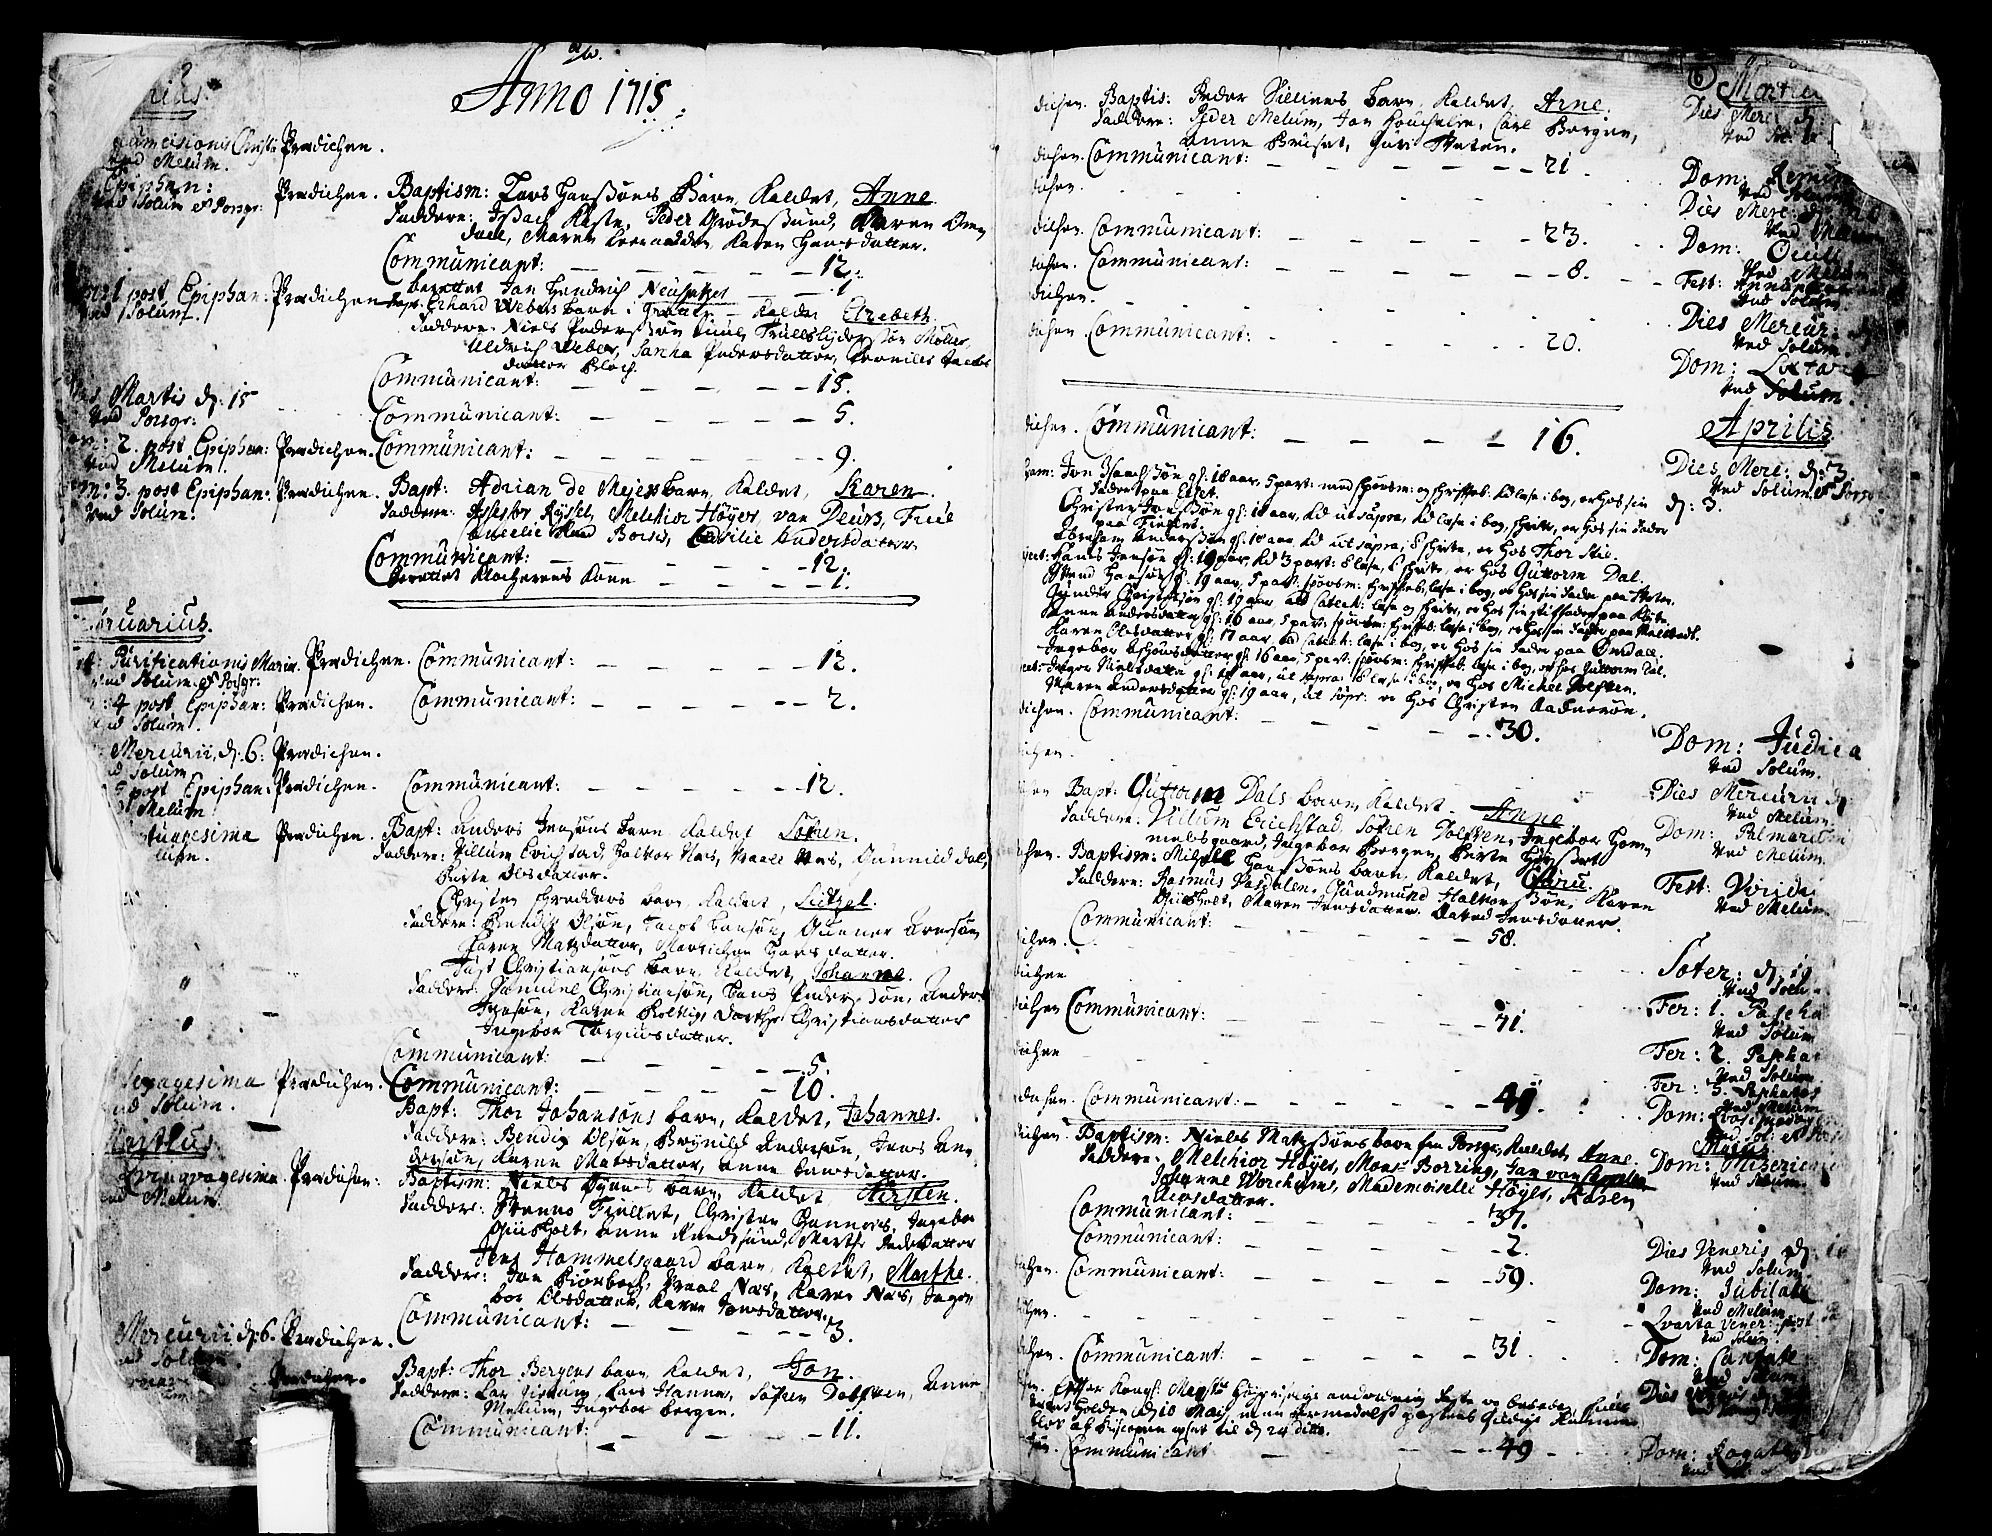 SAKO, Solum kirkebøker, F/Fa/L0002: Ministerialbok nr. I 2, 1713-1761, s. 5